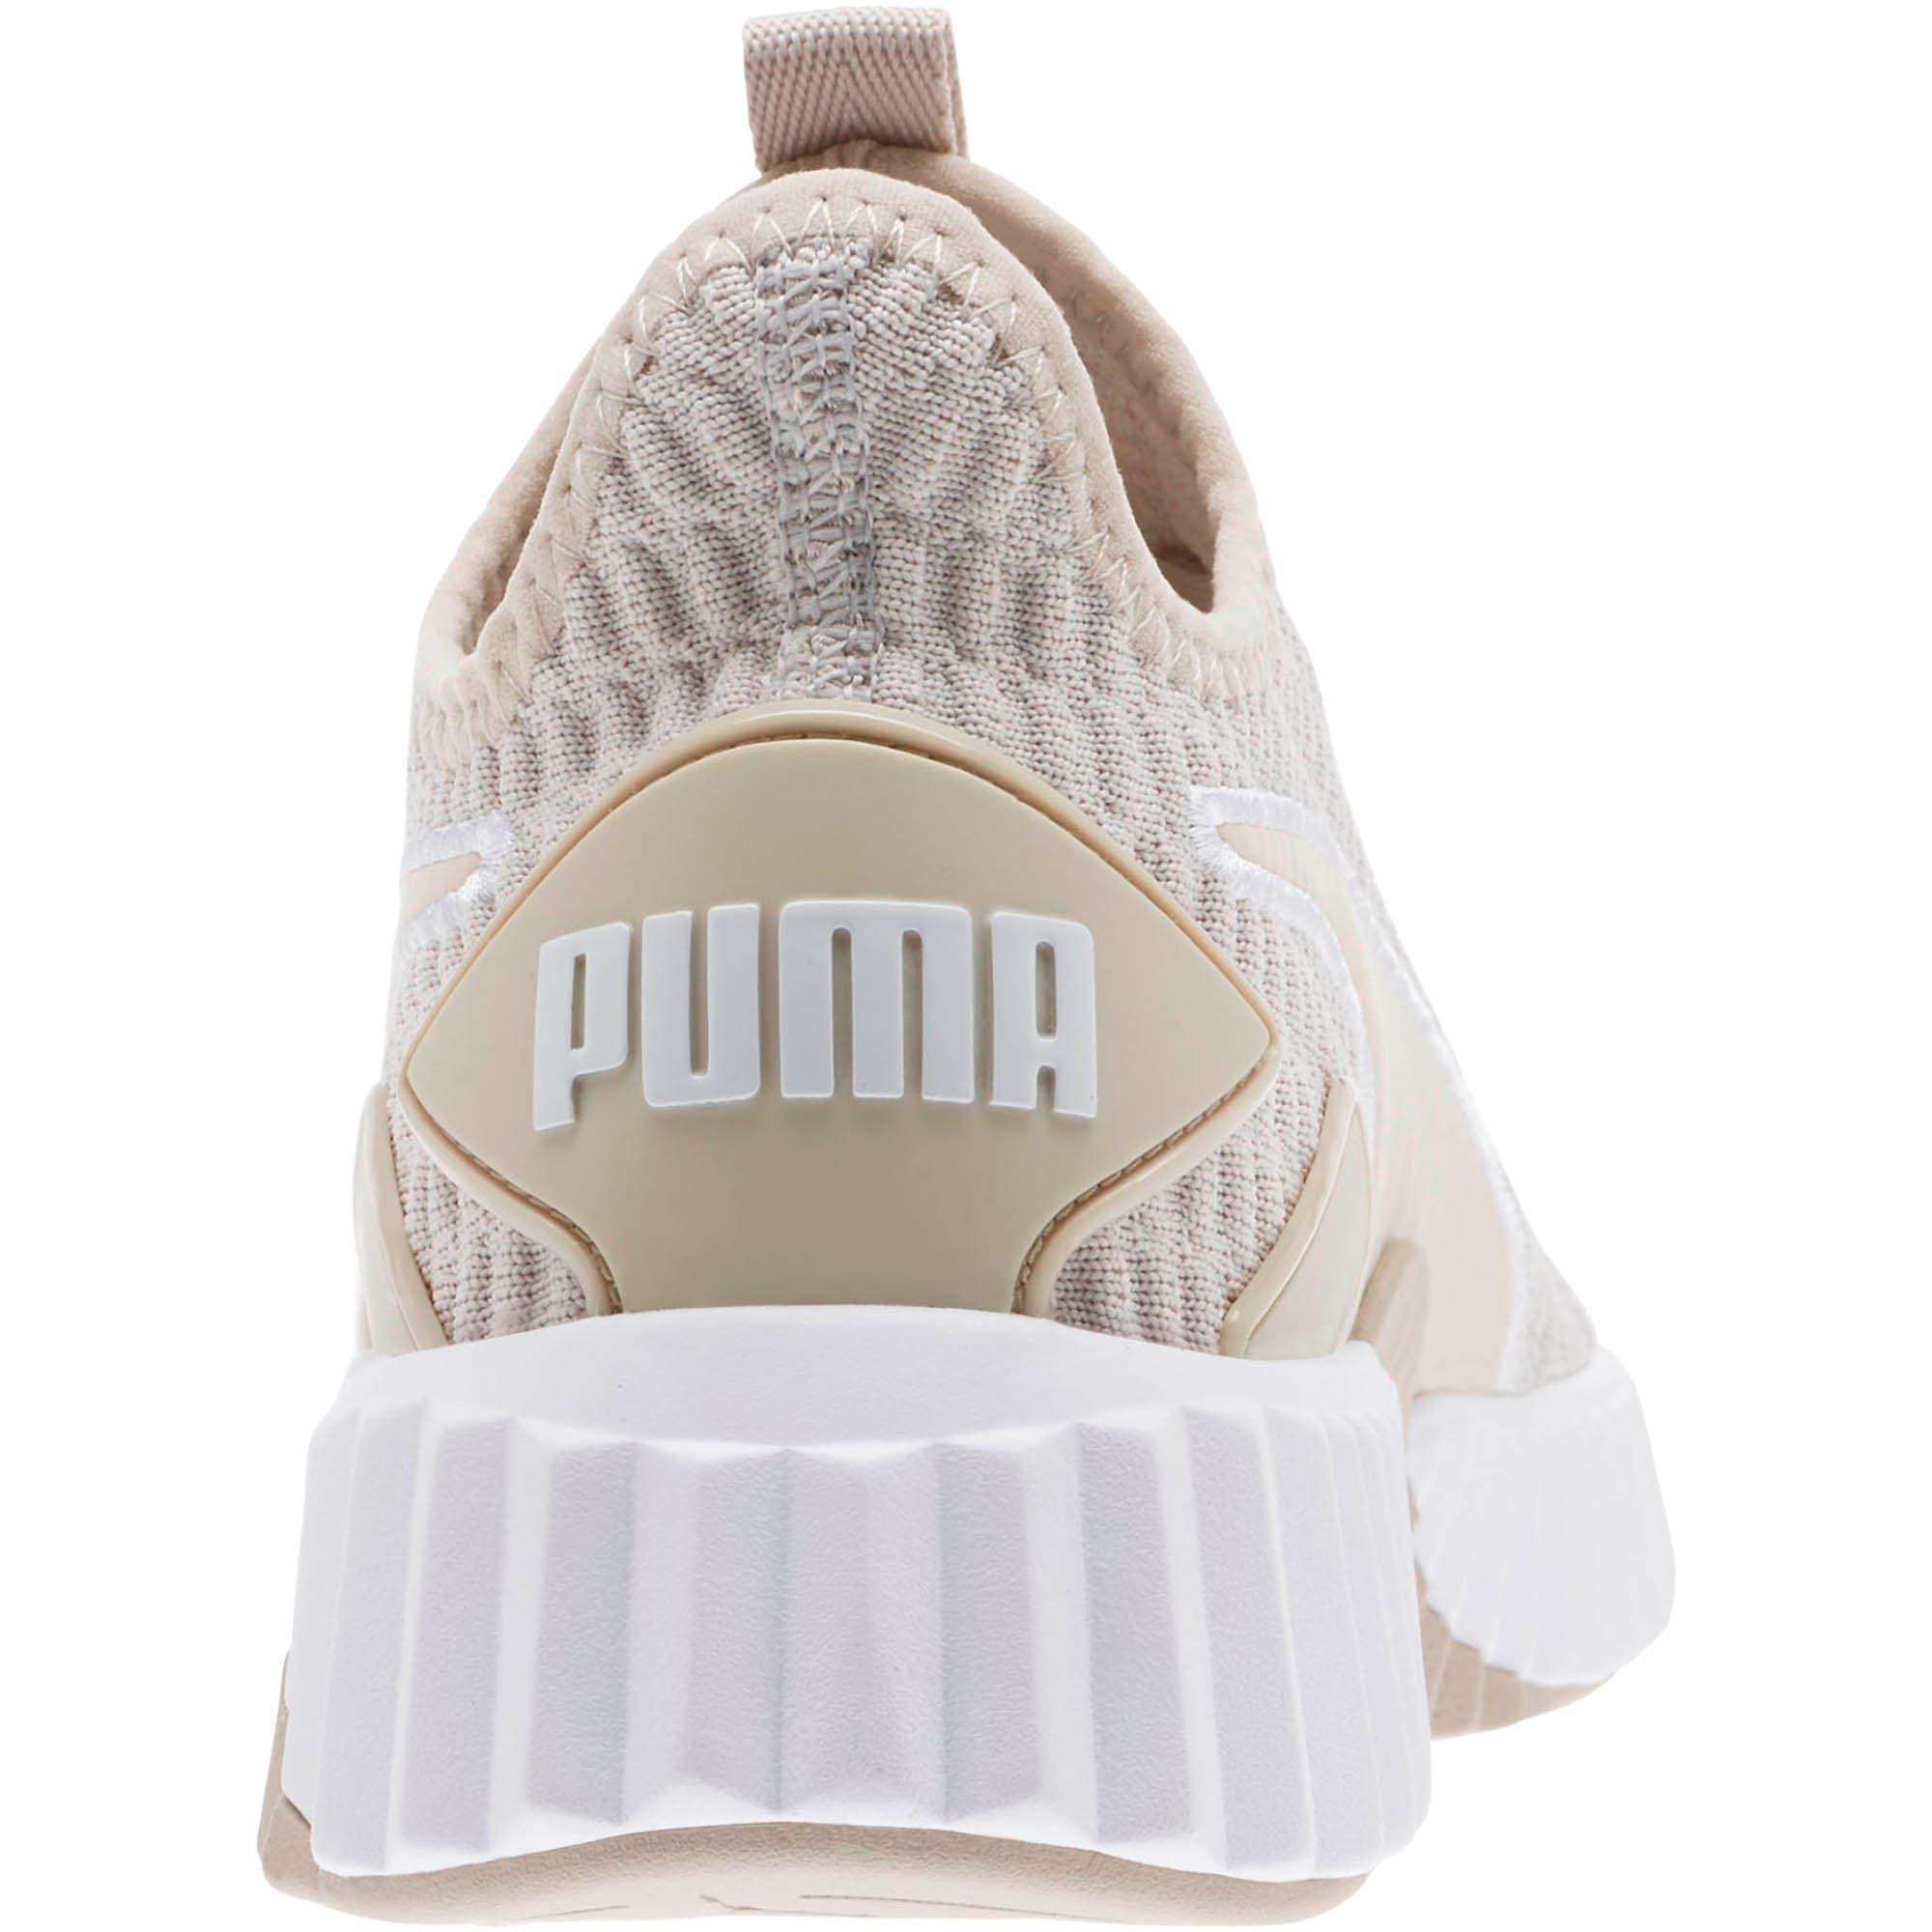 Thumbnail 3 of Defy Women's Training Shoes, Silver Gray-Puma White, medium